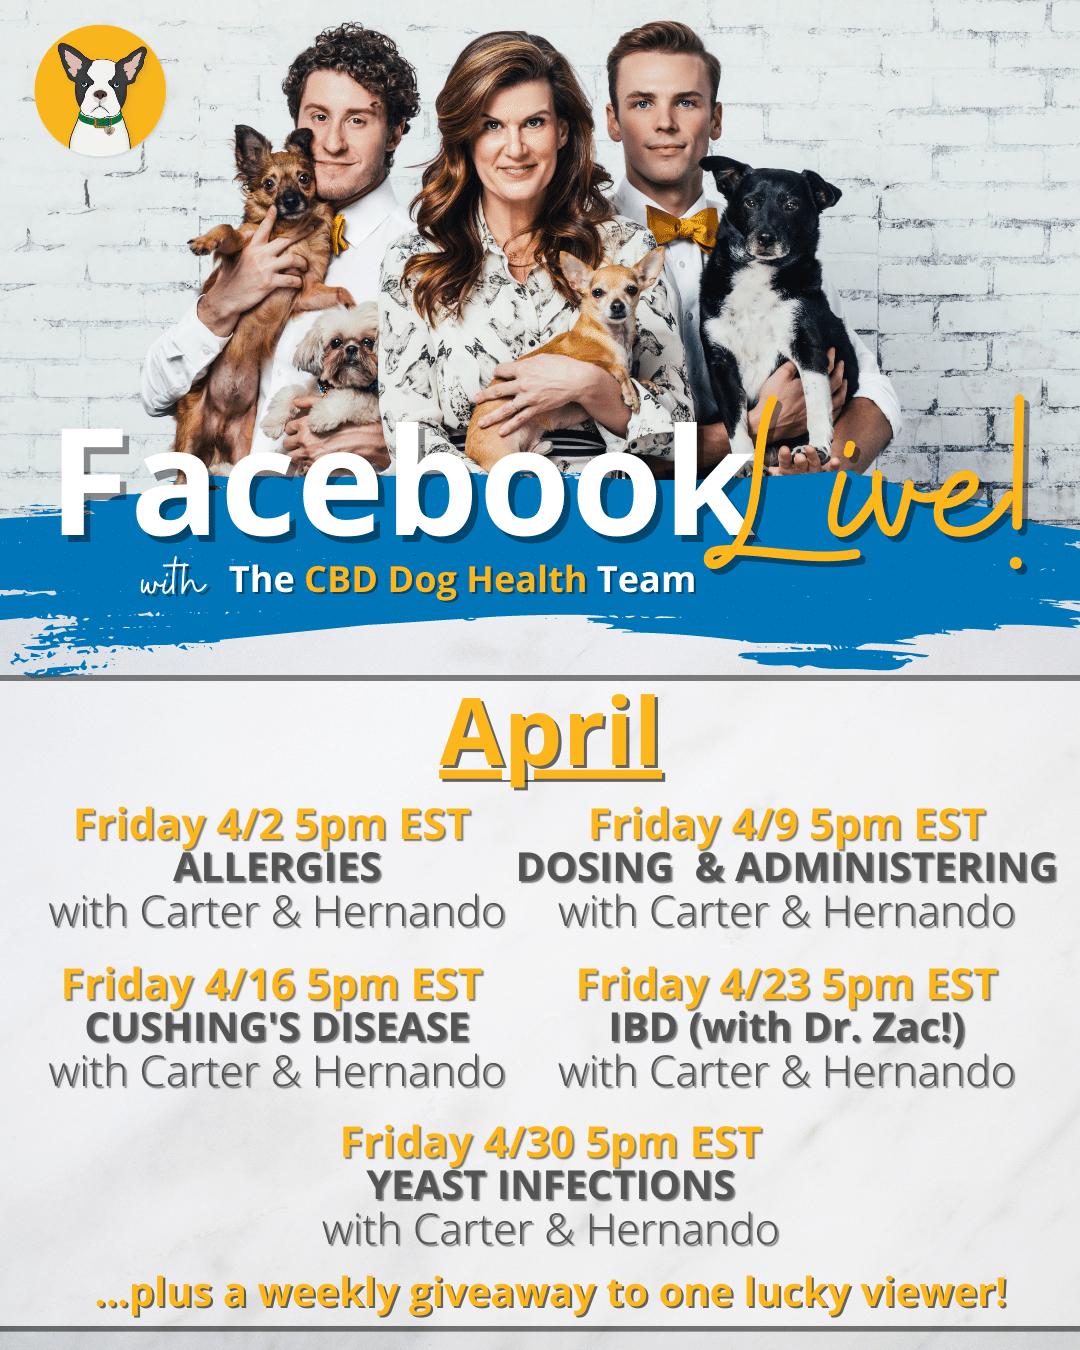 Facebook Live Schedule April